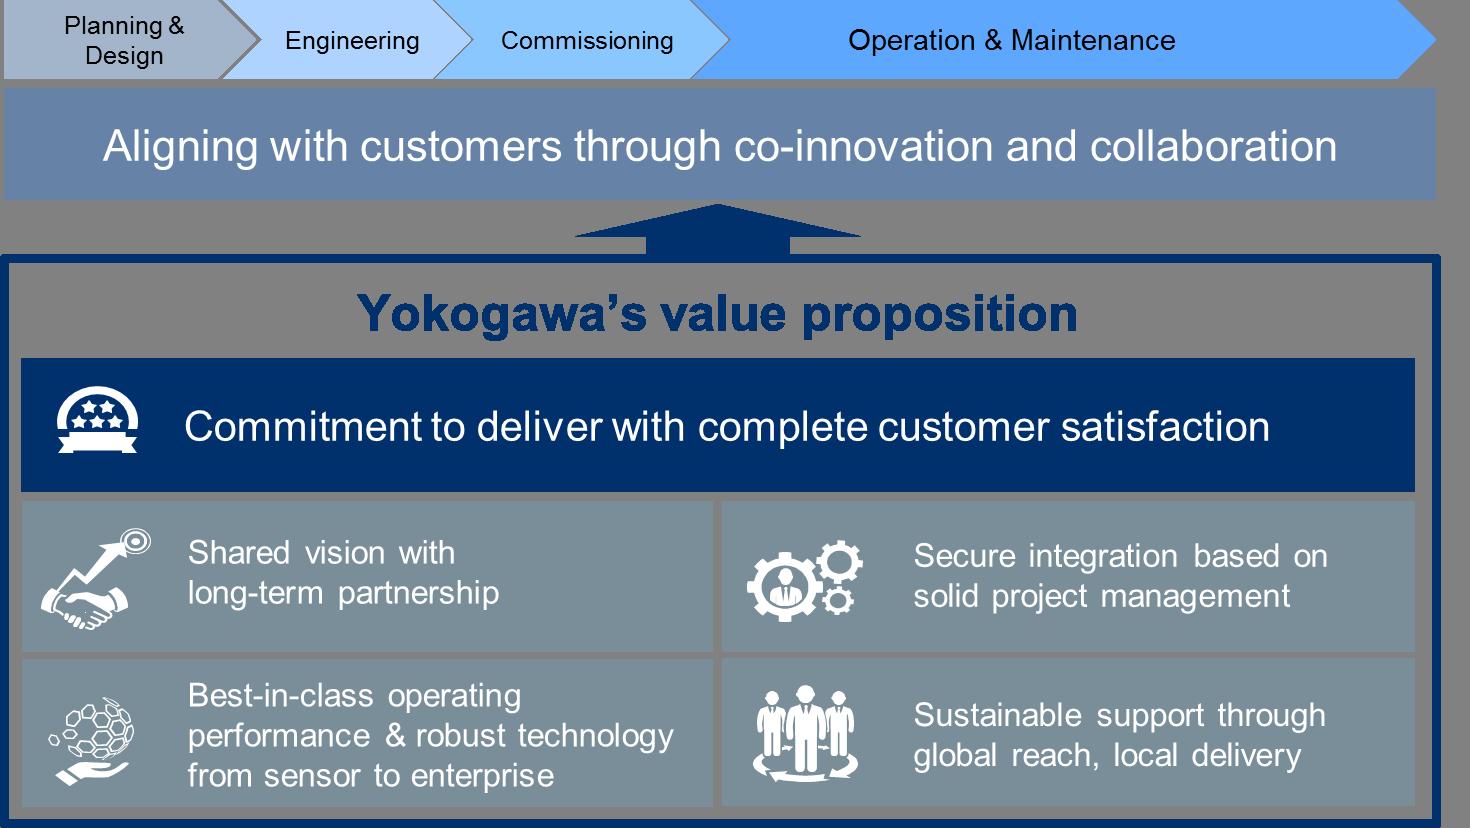 Yokogawa's value proposition thumbnail